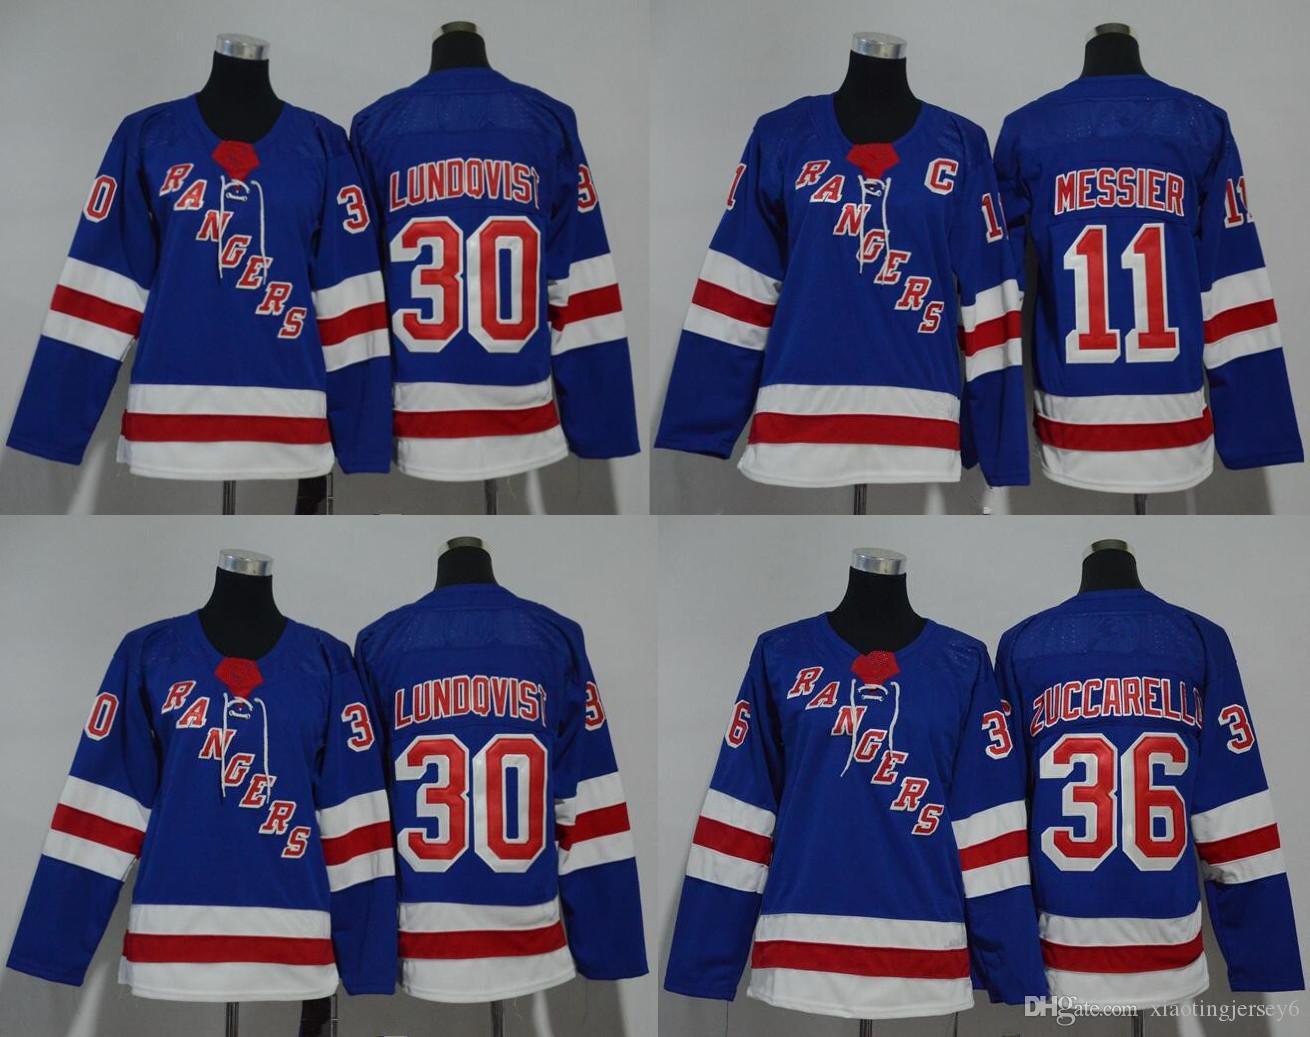 2019 New York Rangers 2018 Winter Classic Jerseys 11 Mark Messier 30  Lundqvist 36 Zuccarello 20 Kreider Youth Stiched Jerseys S XL From  Xiaotingjersey6 f81148a3b9c